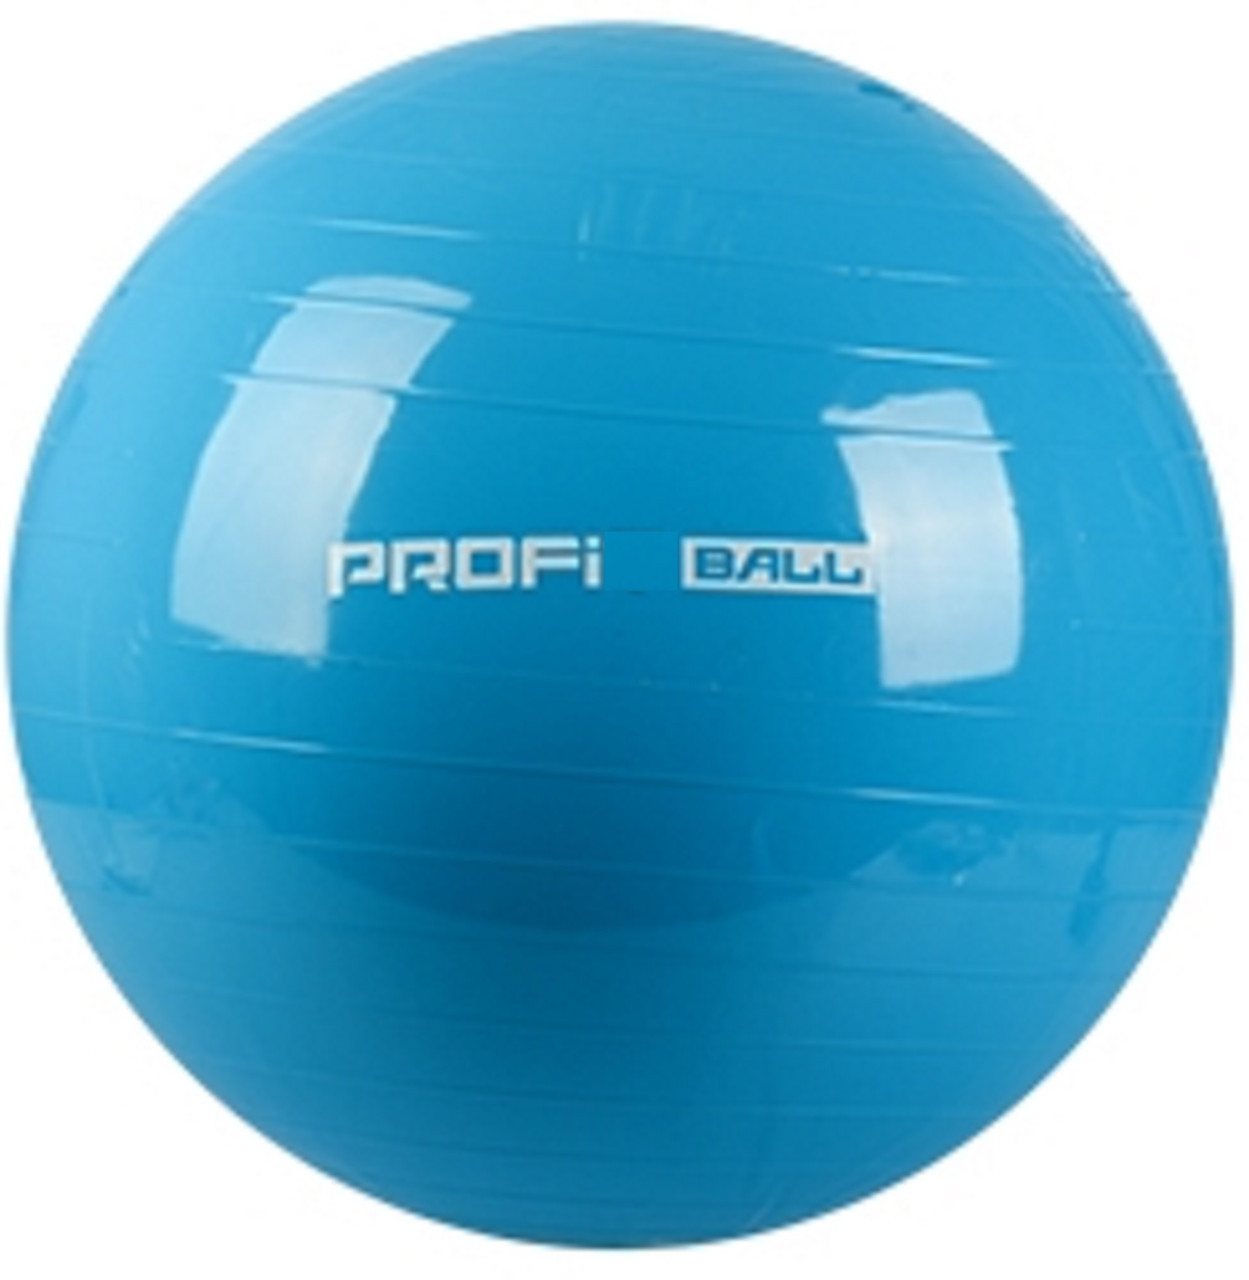 Фитбол 85 см Profi Ball (MS 0384) Голубой